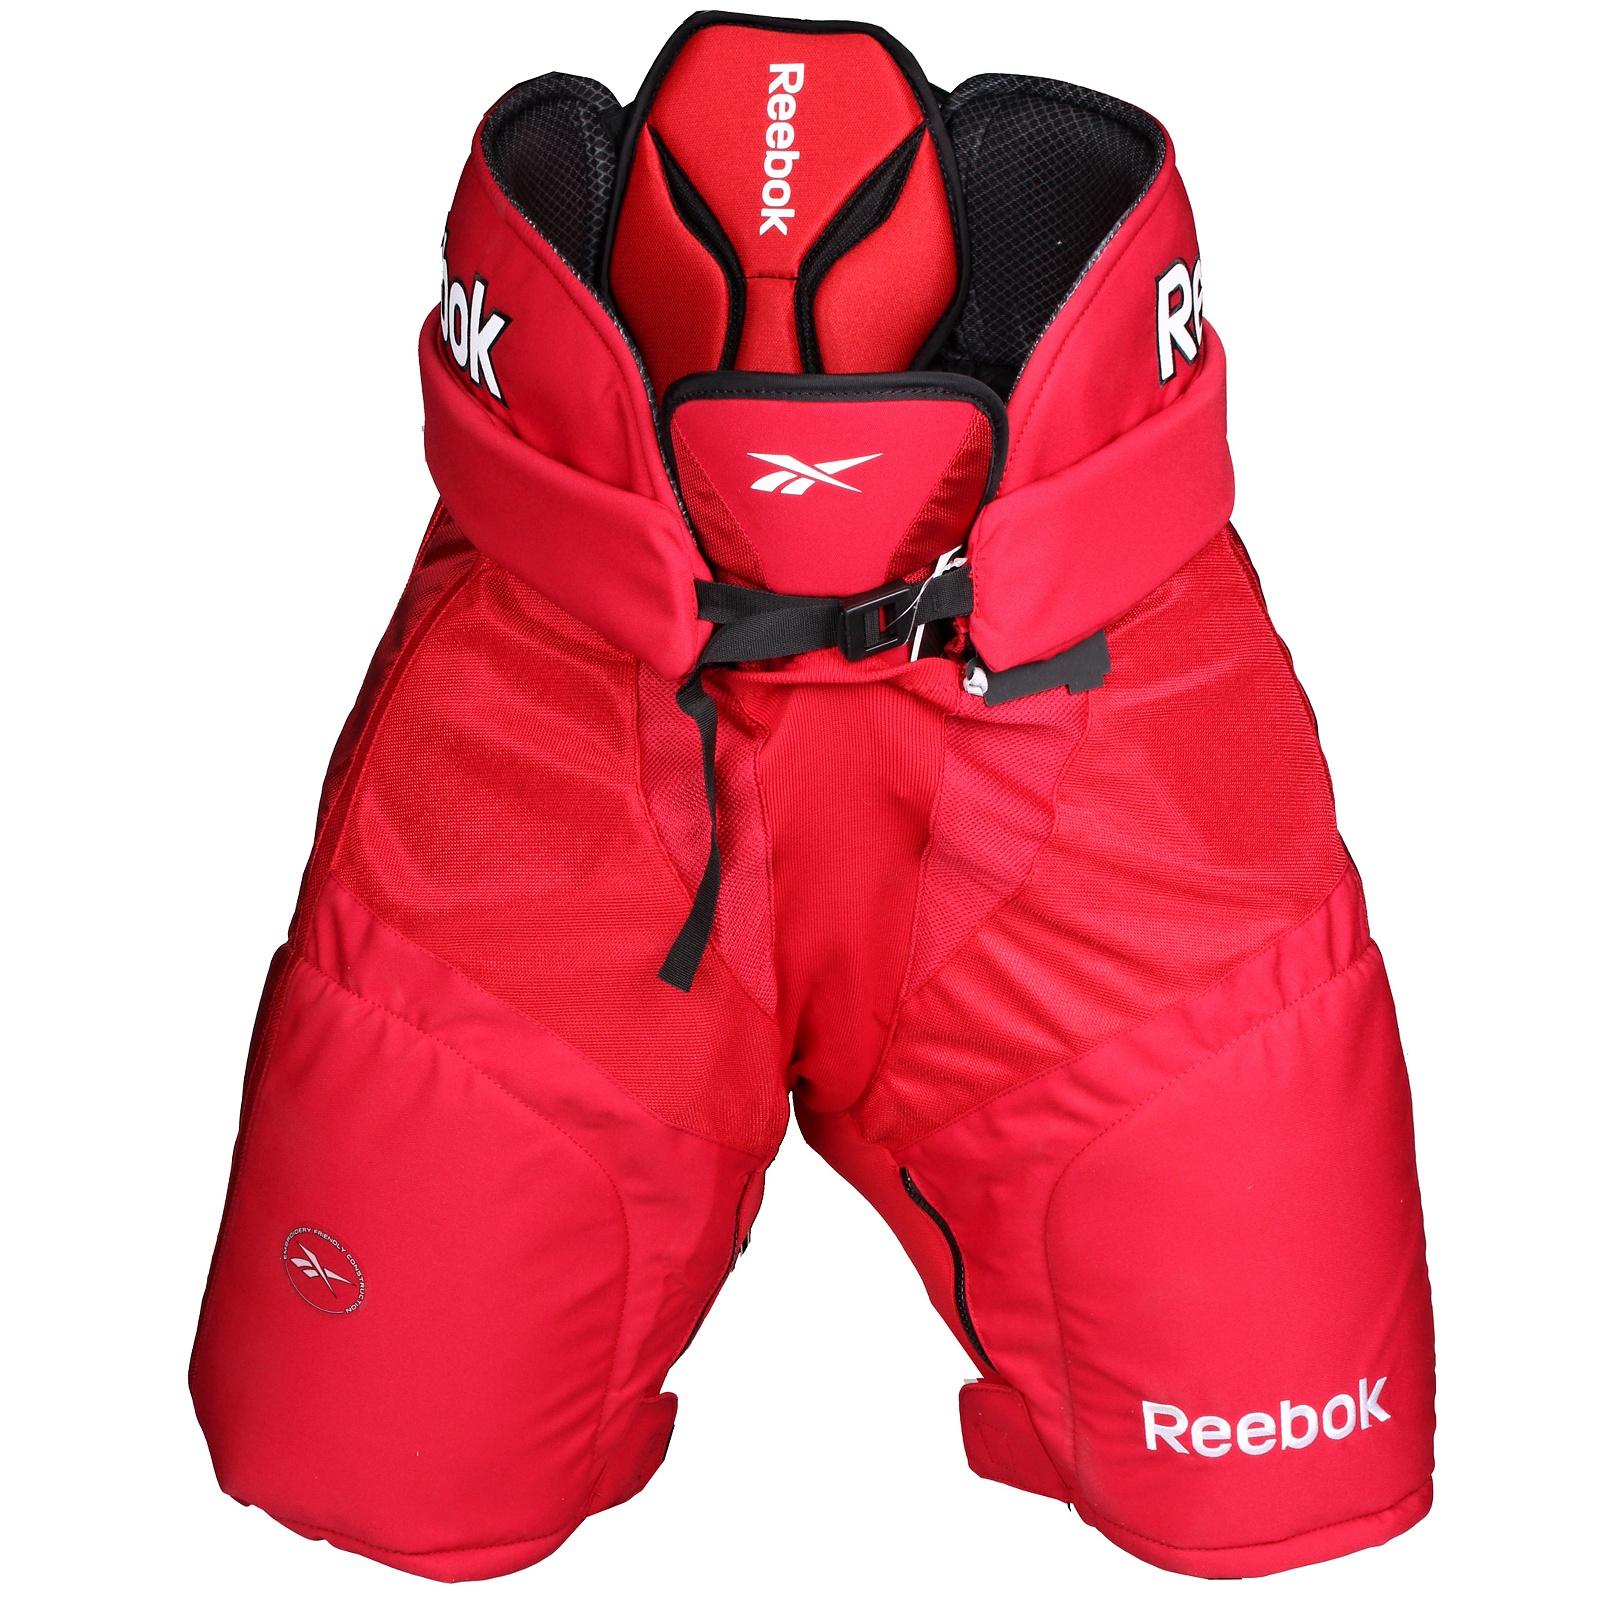 Kalhoty hráčské REEBOK 18K senior červené - vel. XL